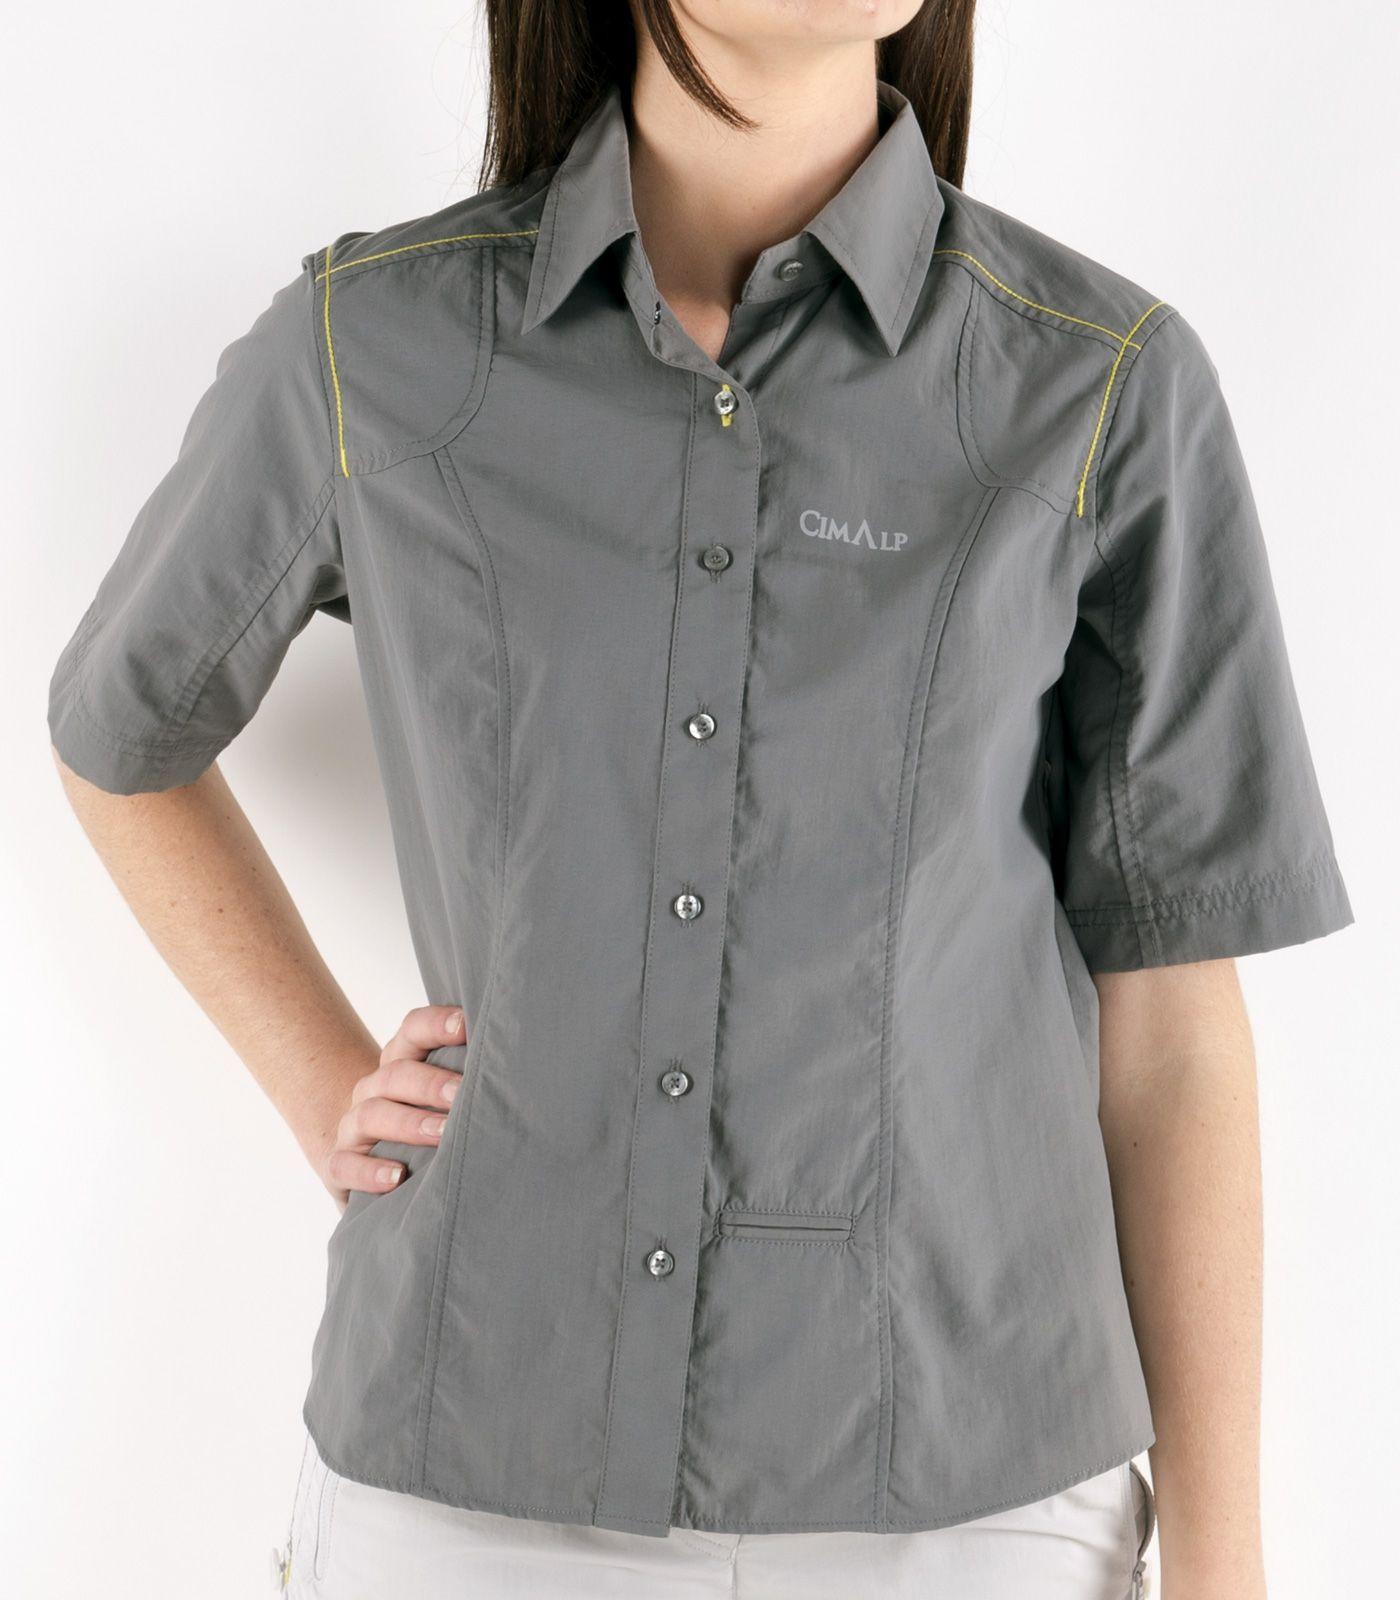 chemise femme anti moustiques anna anthracite 2 v tements de voyages. Black Bedroom Furniture Sets. Home Design Ideas